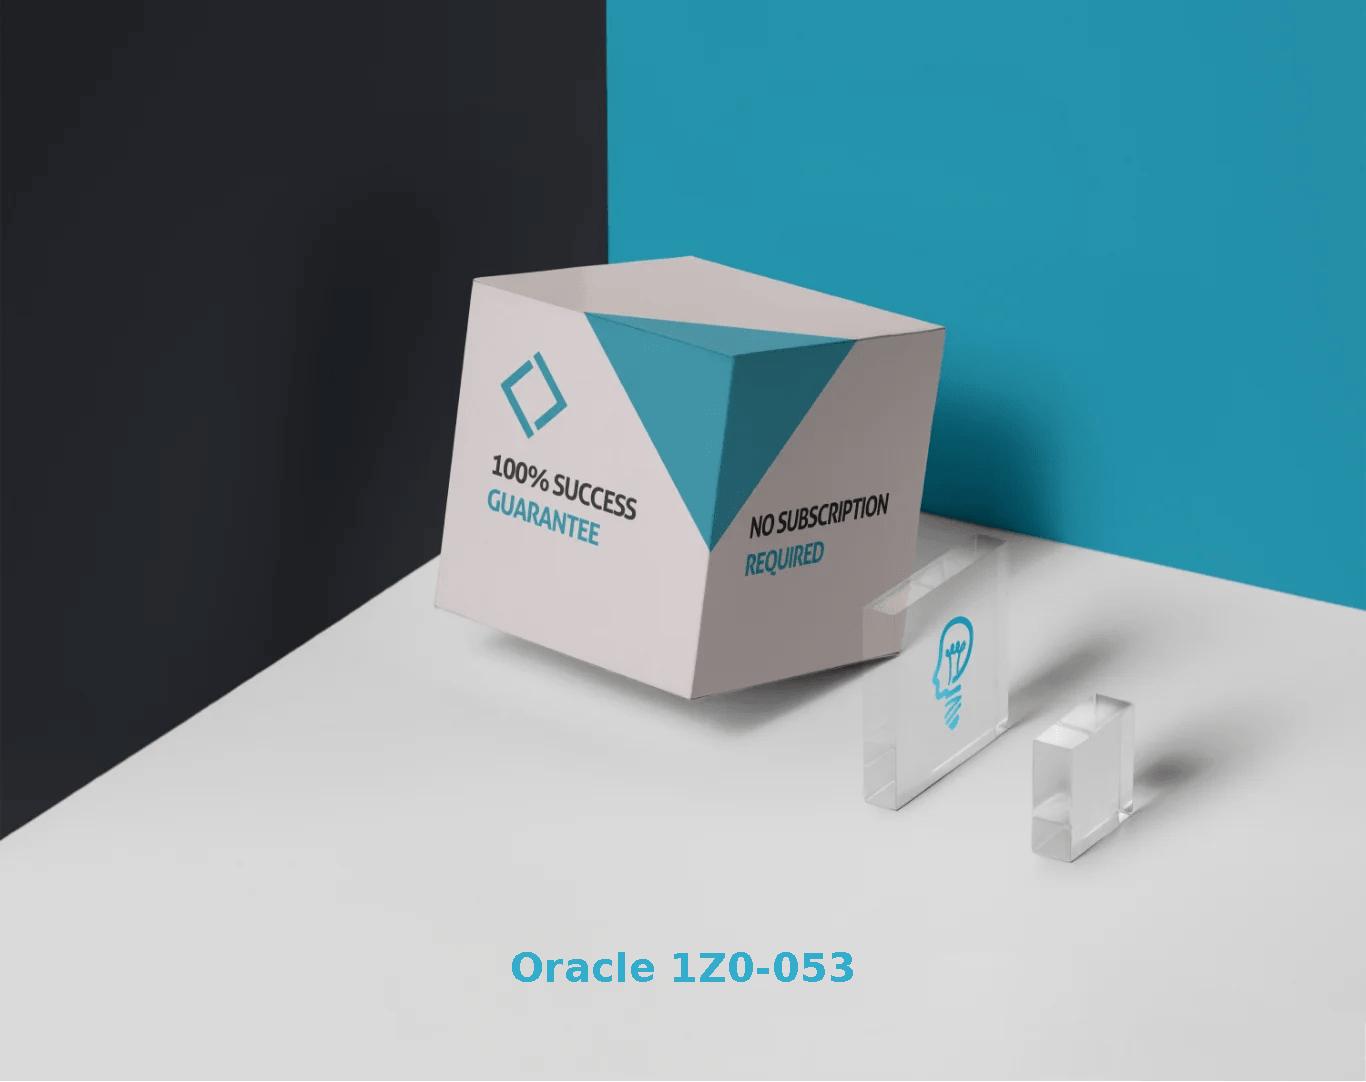 Oracle 1Z0-053 Exams